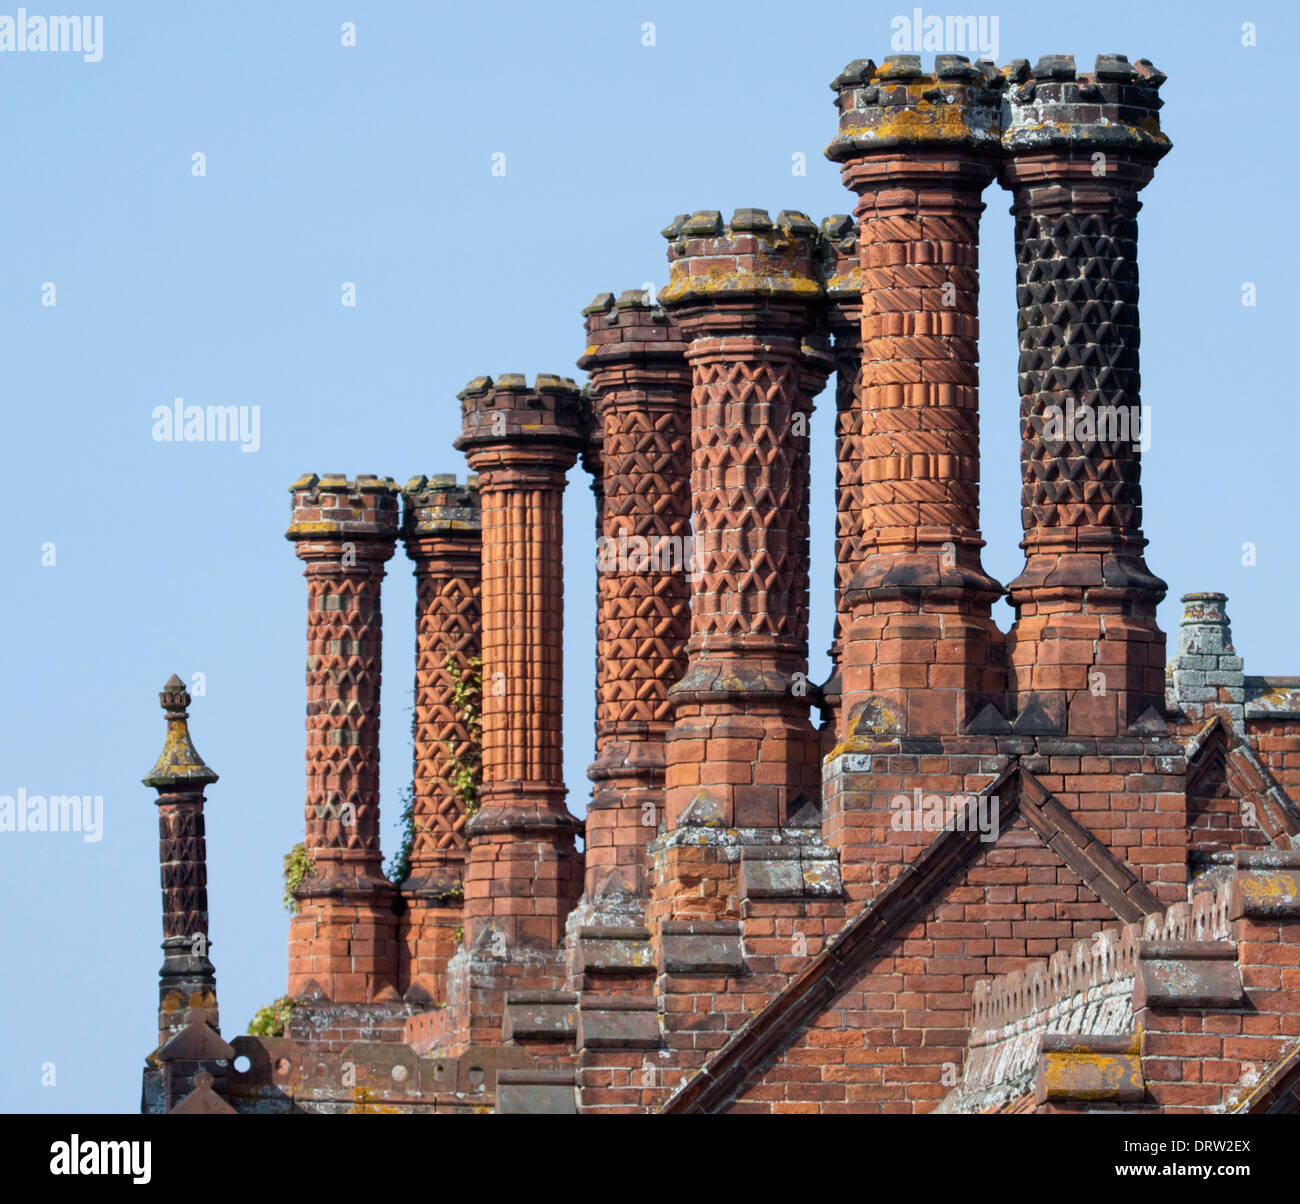 Ornate Tudor style chimney pots - Stock Image